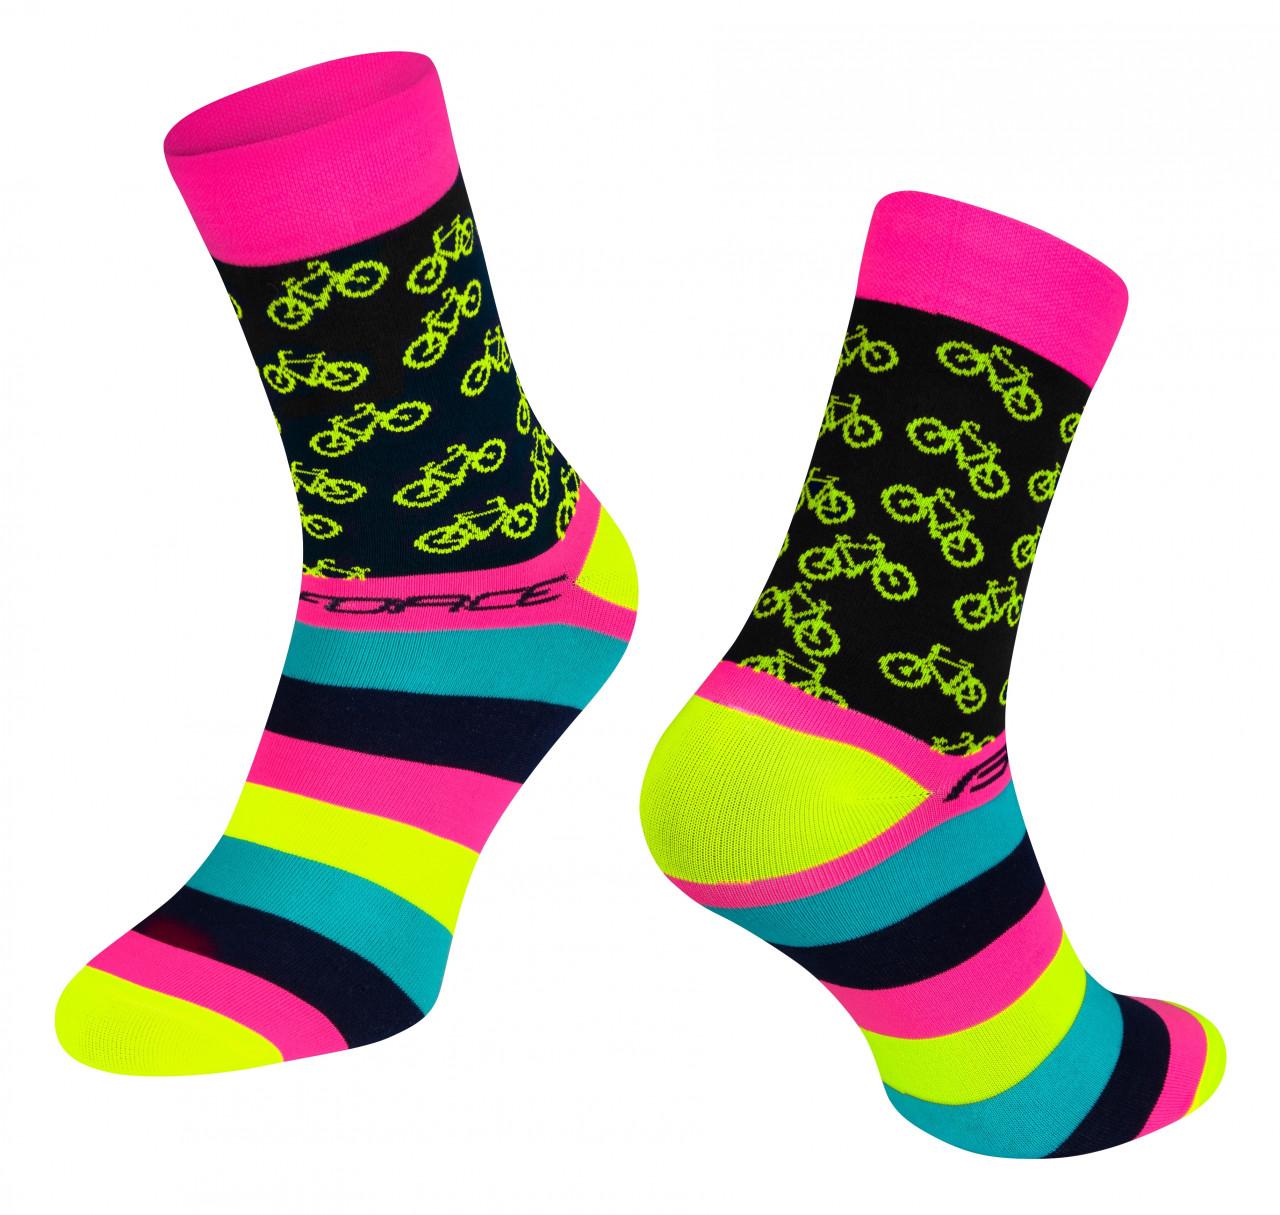 FORCE ponožky CYCLE, ružové S-M/36-41